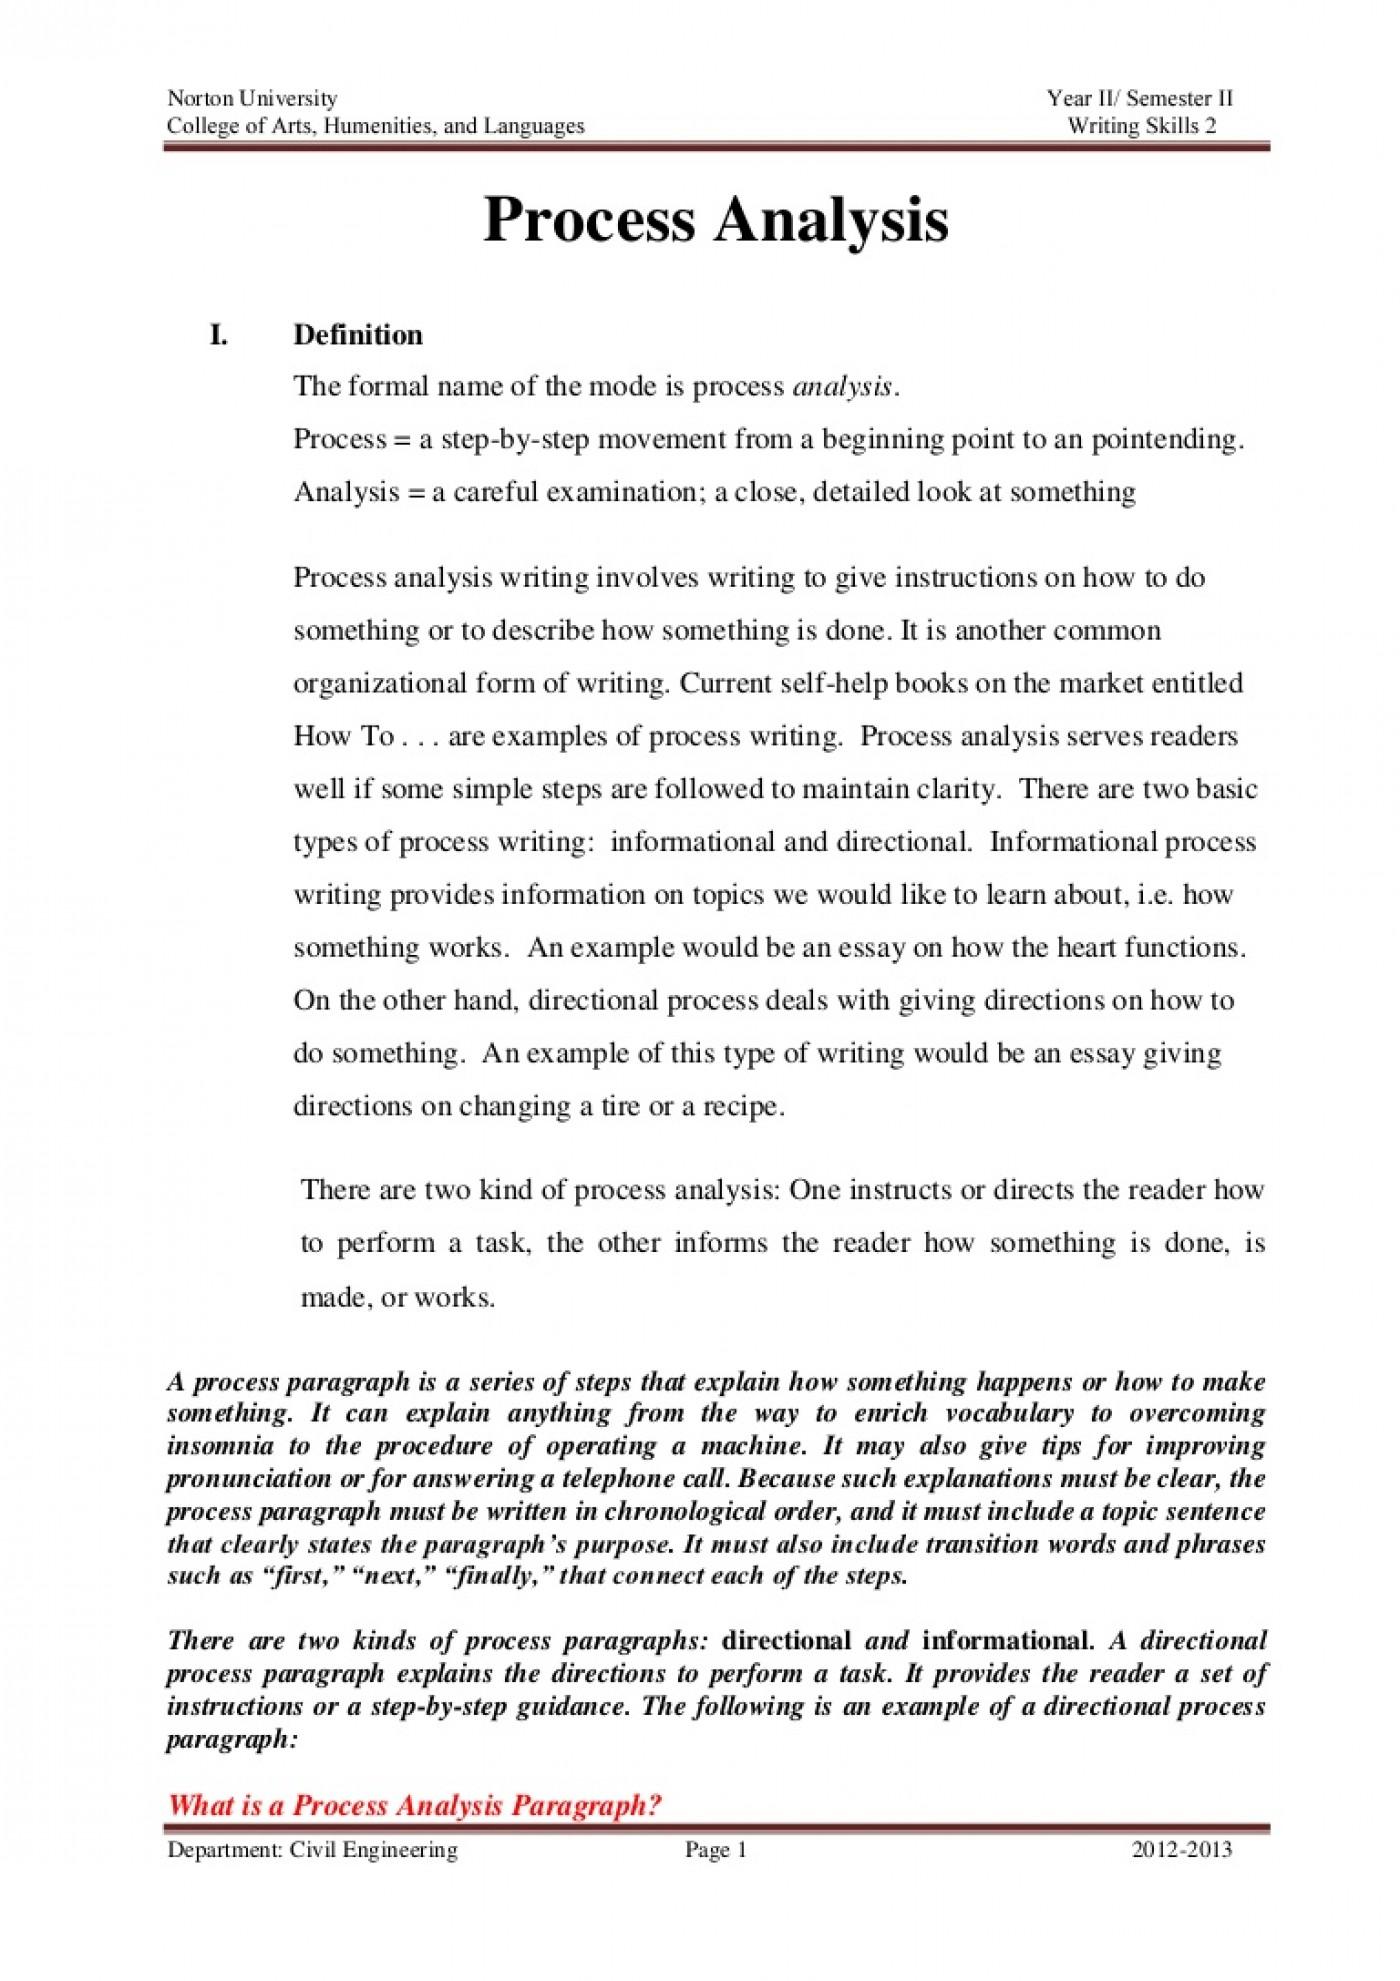 010 process essay definition example thatsnotus